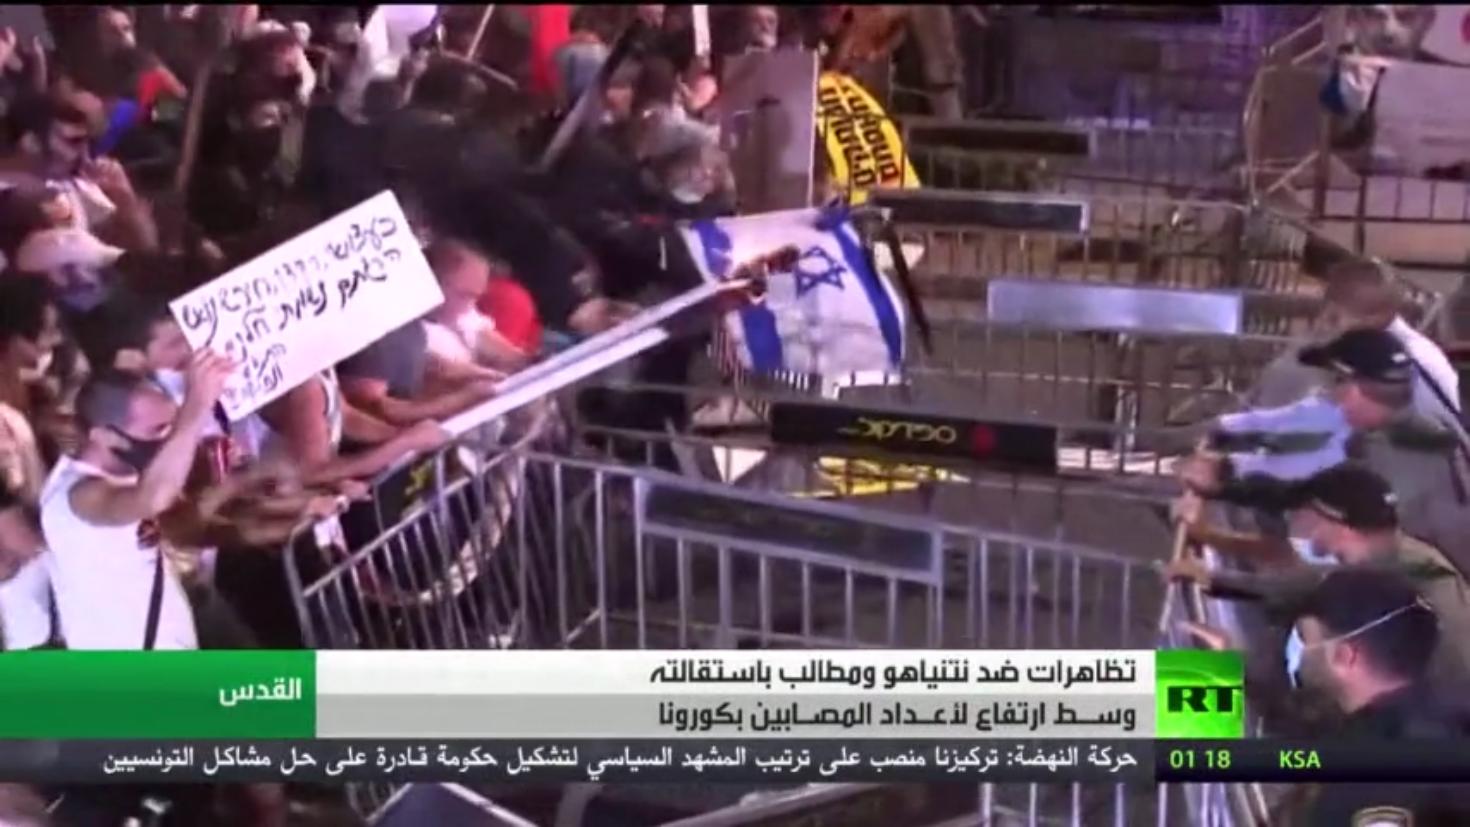 تظاهرات ضد نتنياهو ومطالبات باستقالته